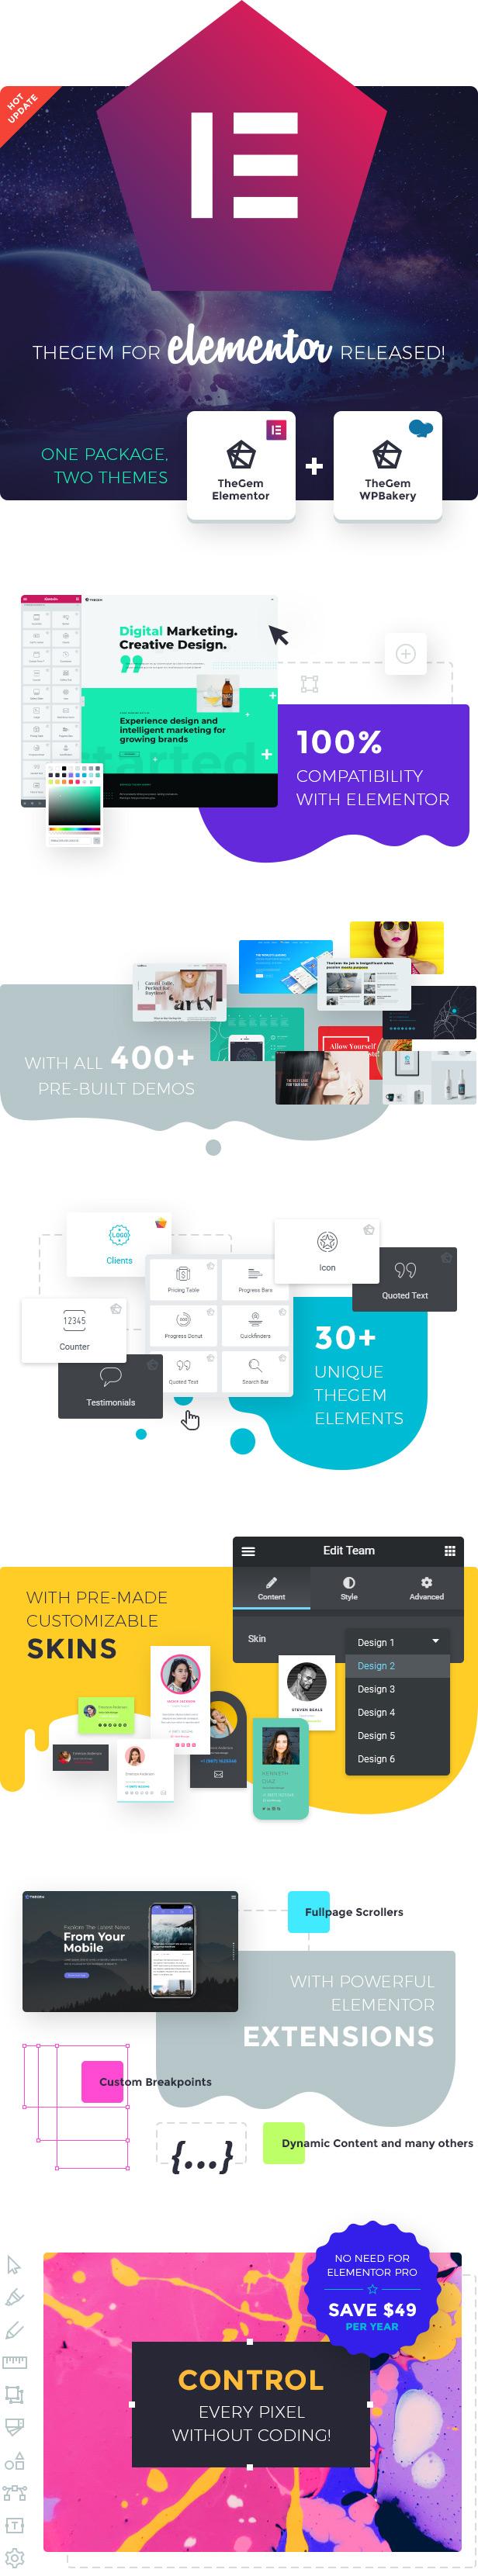 TheGem - Creative Multi-Purpose High-Performance WordPress Theme - 1